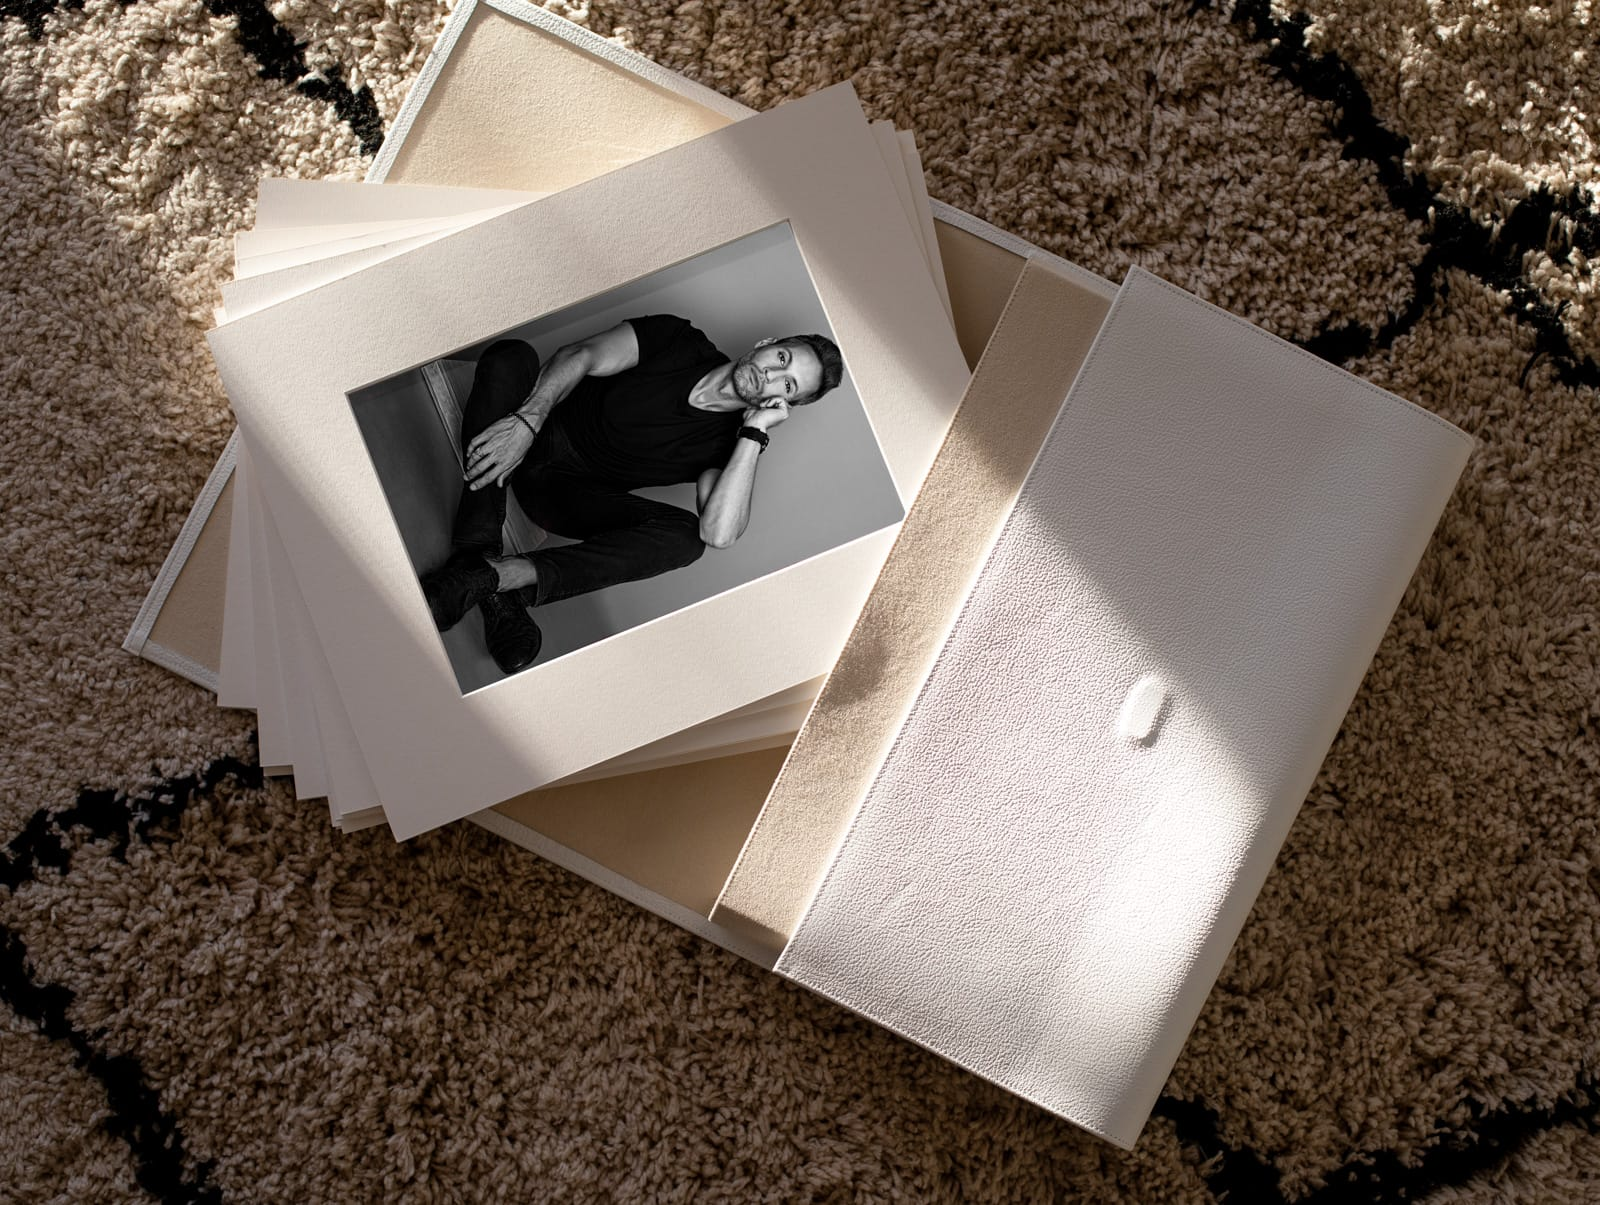 Tus fotografías Producto Nuestro Portfolio Pro La Gallarda Fotografia Profesional mejor estudio fotografico Malaga Alhaurin Marbella fotógrafo recomendado photographer fotografas retrato boudoir moda bebe familia espacios